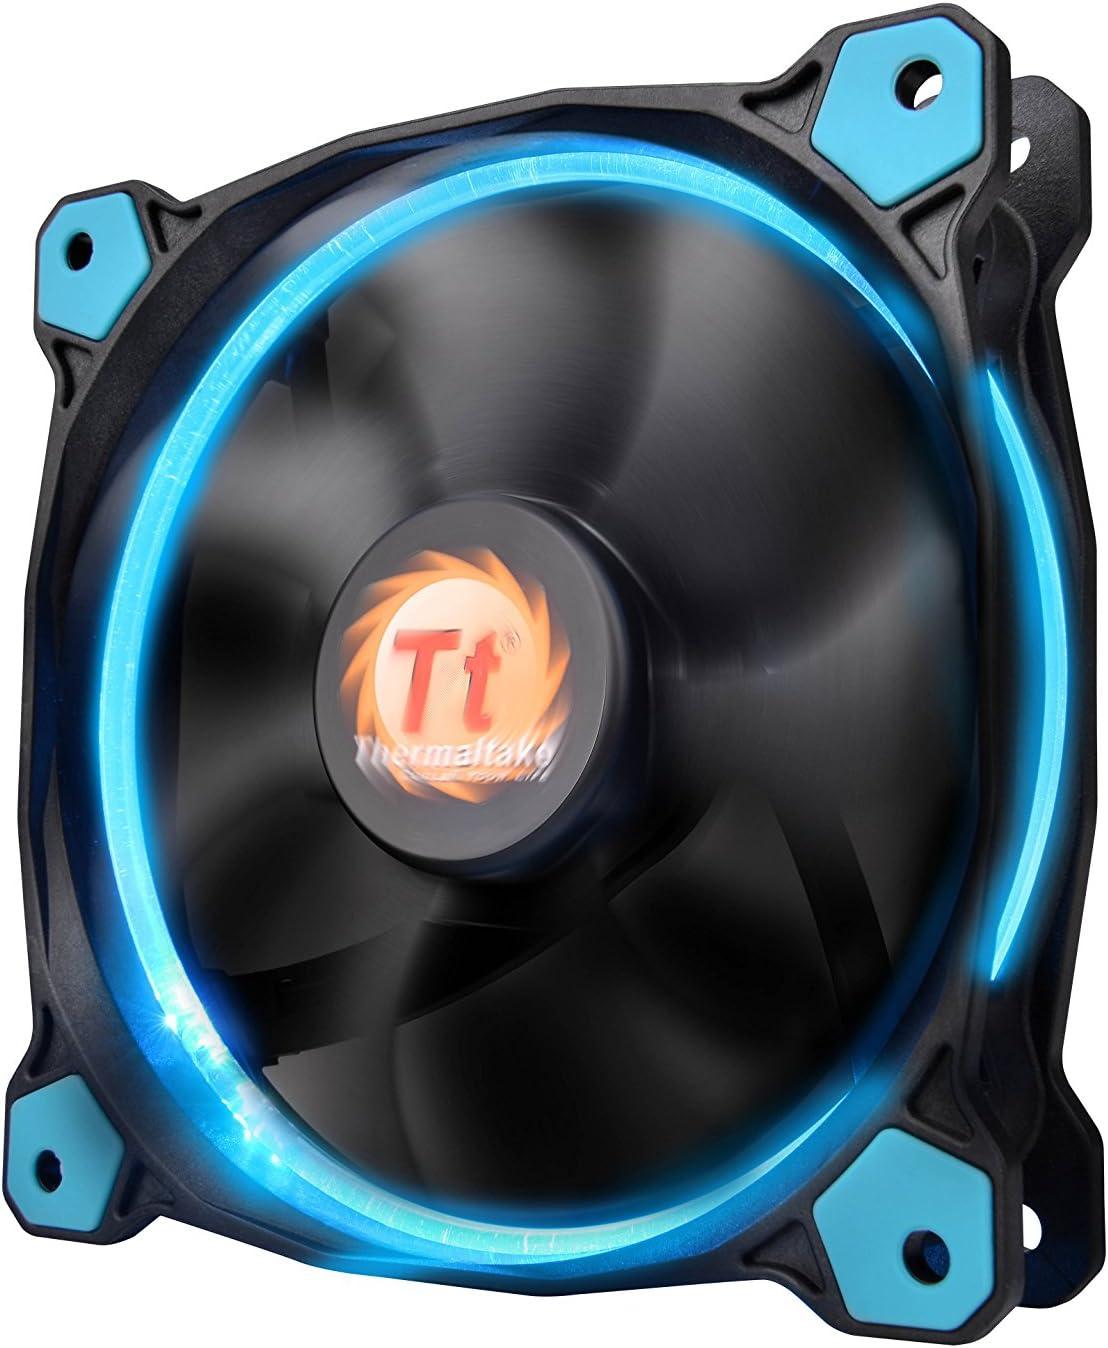 Best Static Pressure Fan for Radiator